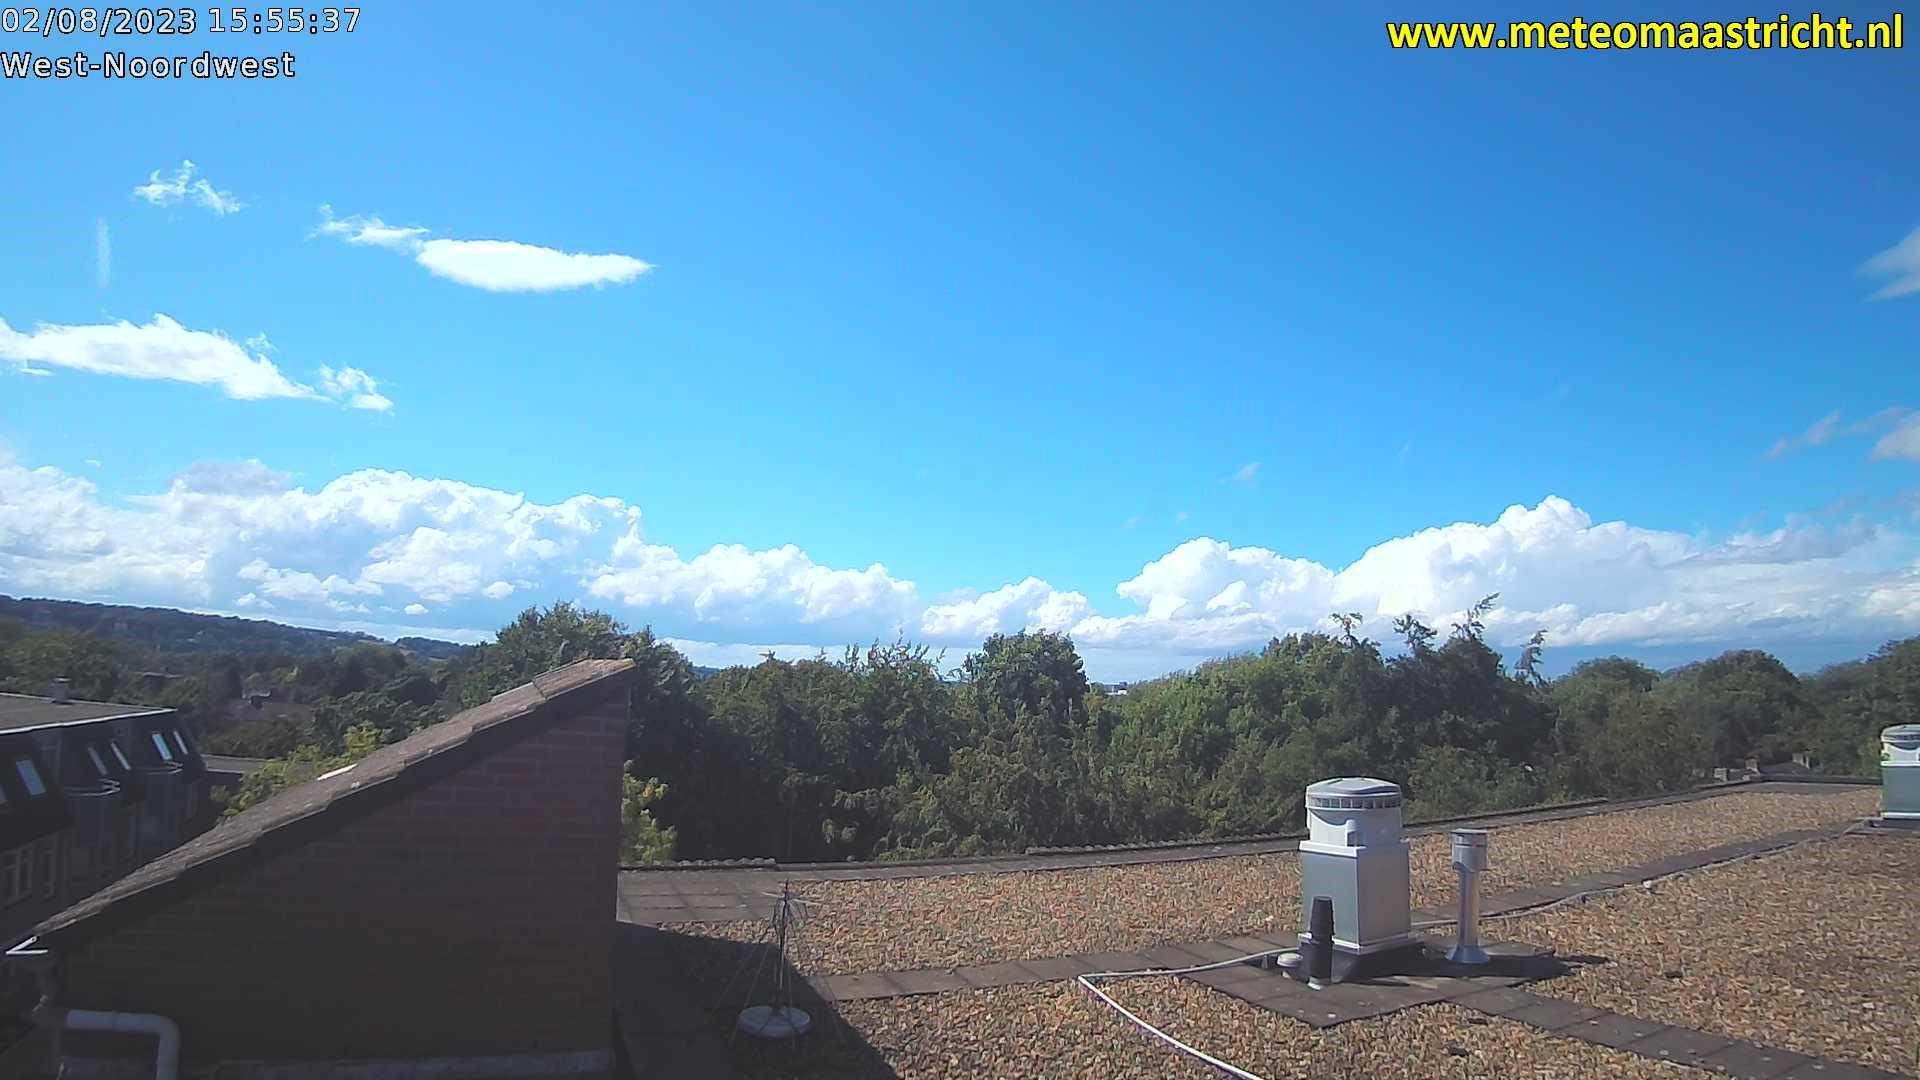 Webkamera Gronsveld: Maastricht − De Heeg (view northwest)